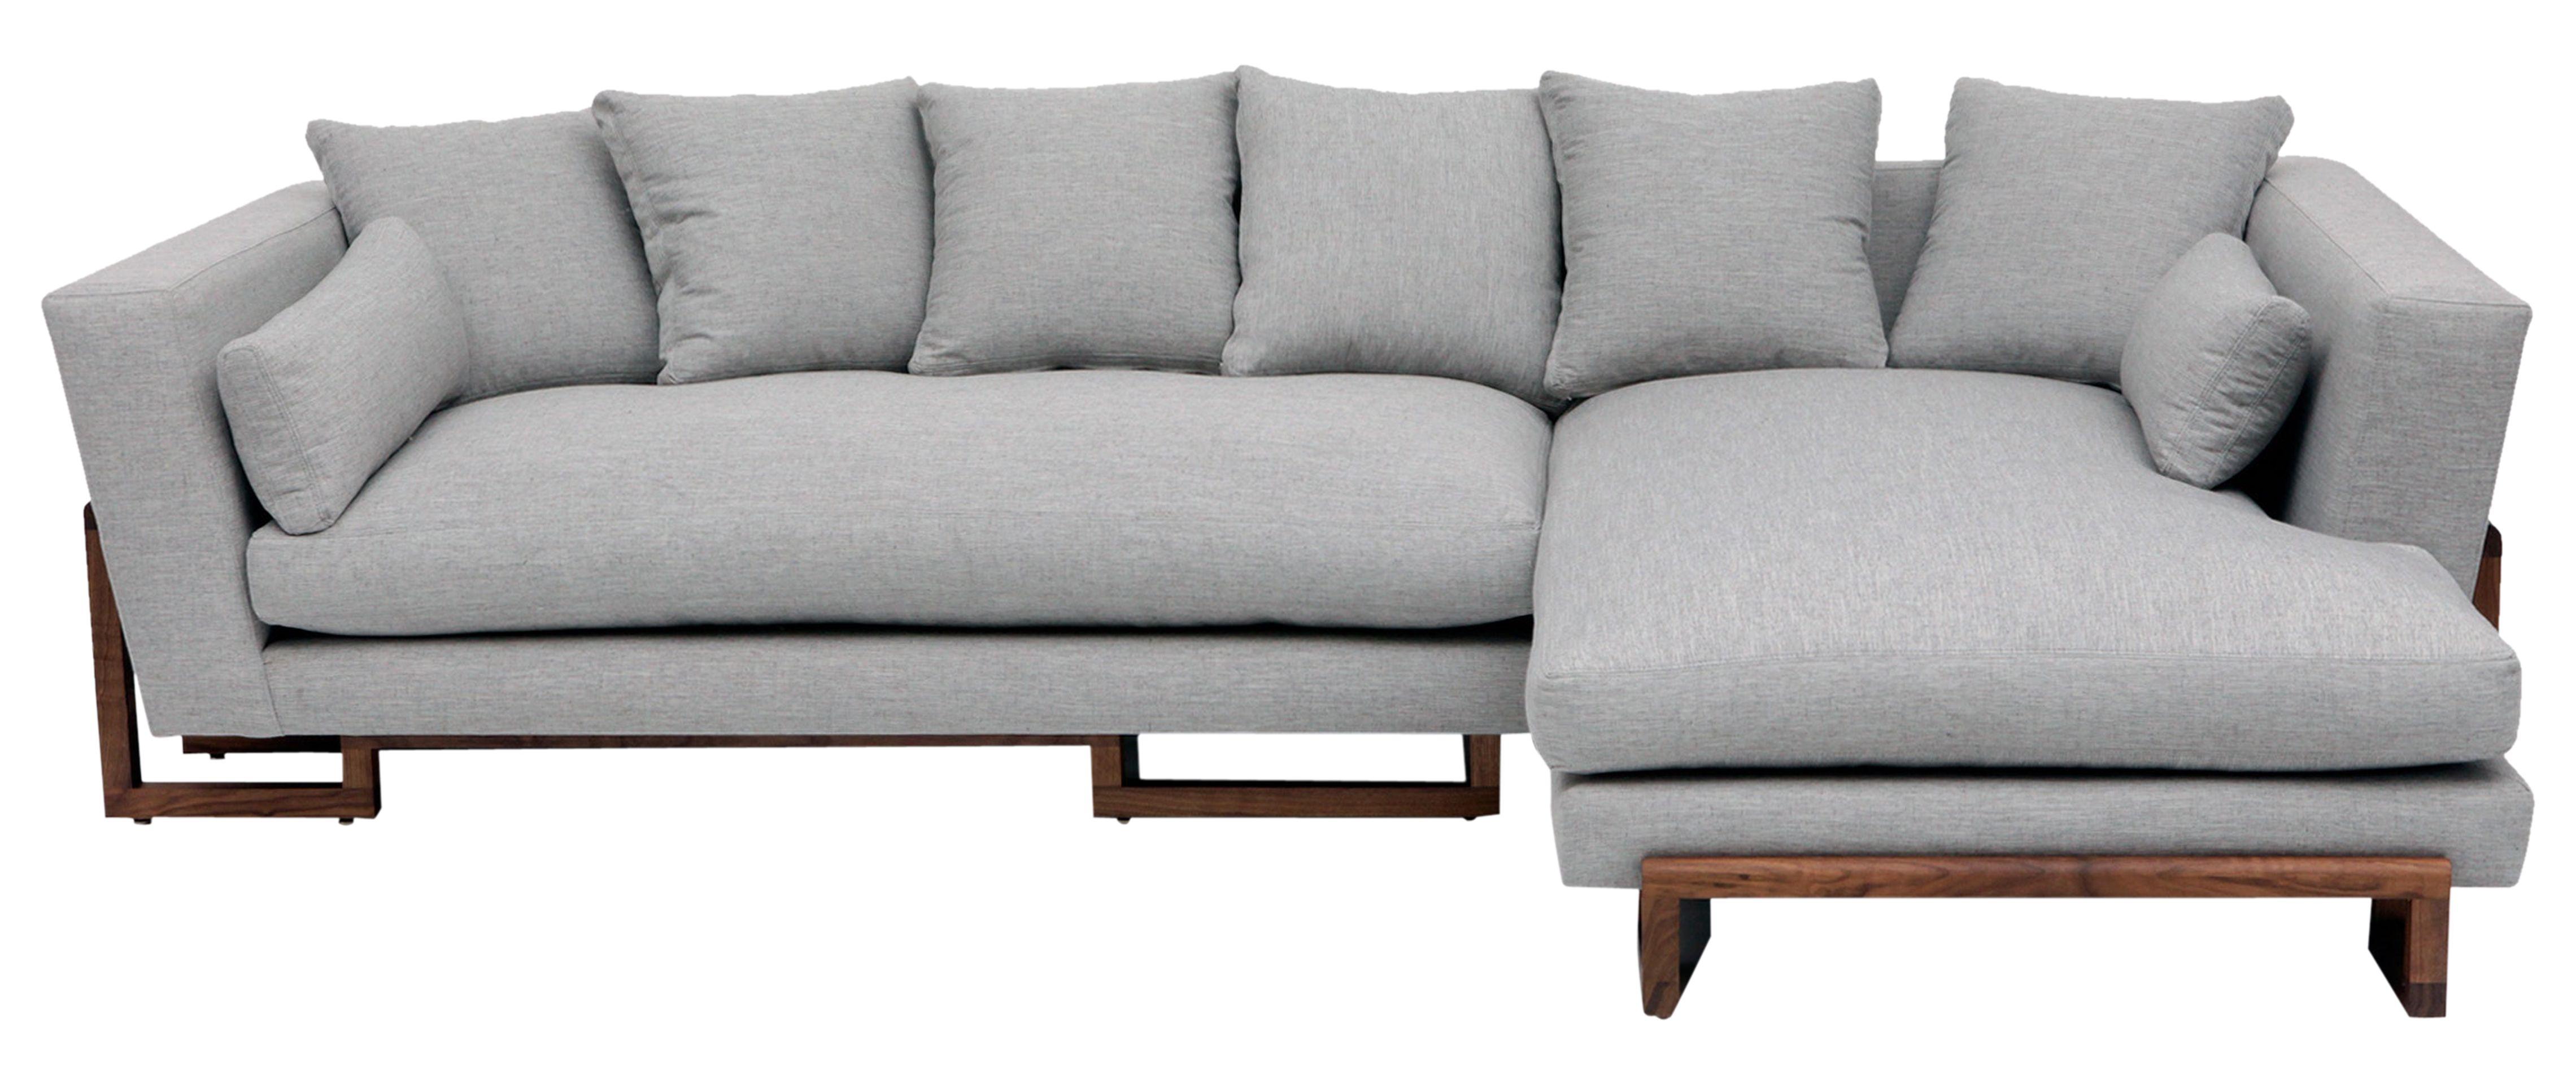 Lrg Sectional Mid Century Modern Sofa Sectional Sofa Modern Sofa